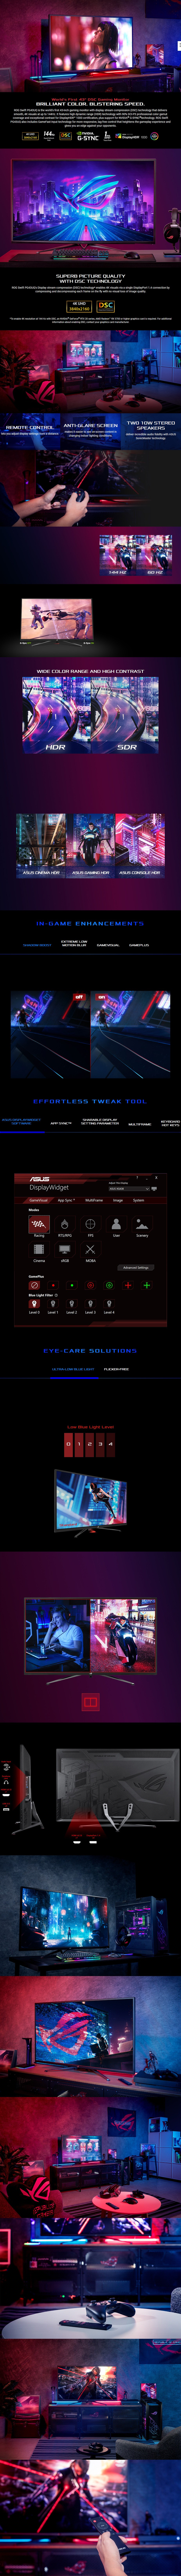 asus-rog-swift-pg43uq-43-144hz-4k-uhd-1ms-gsync-ready-hdr-gaming-monitor-ac33567-7.jpg